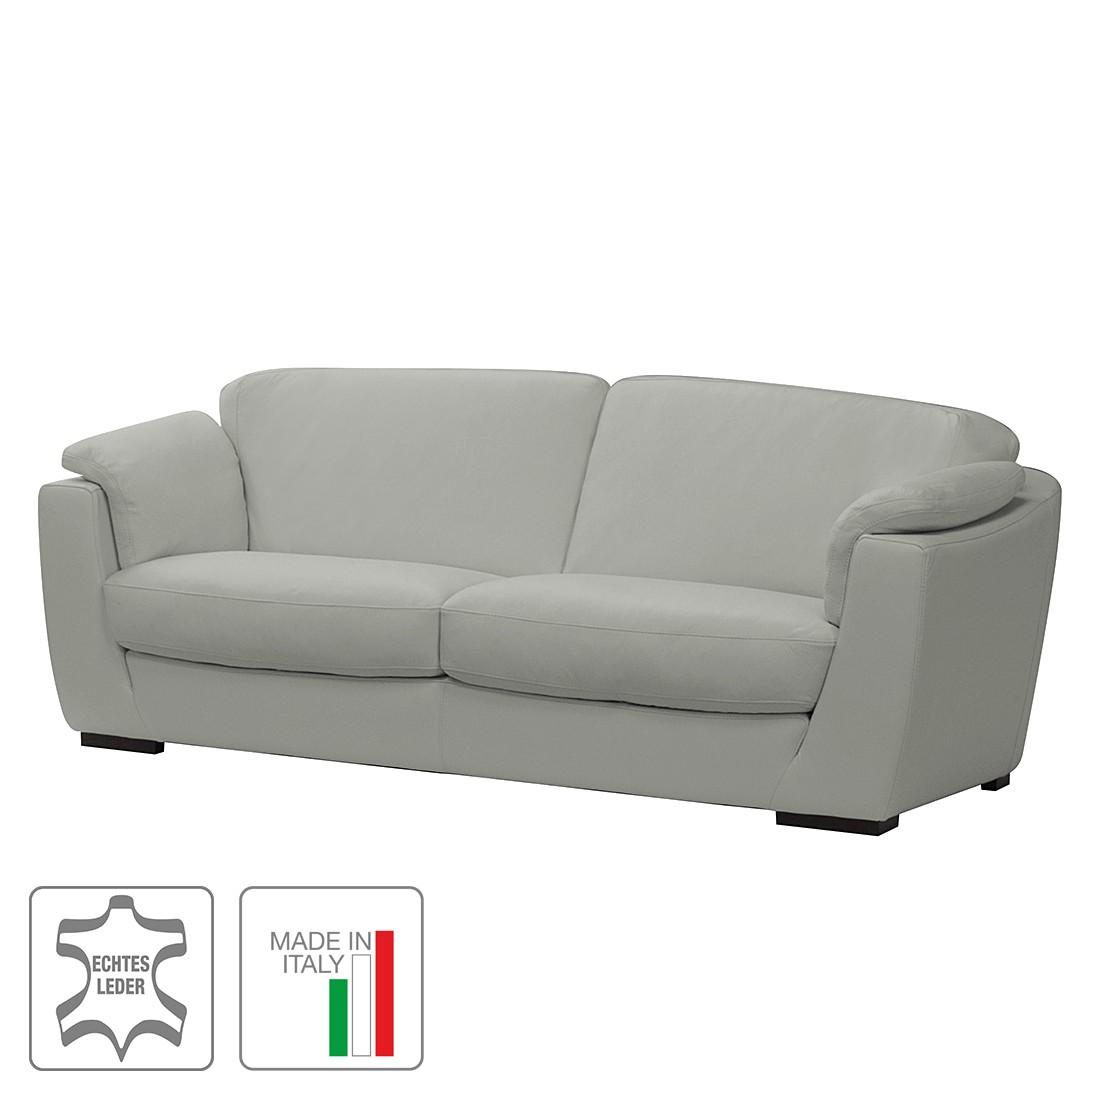 sofa bries 3 sitzer echtleder grau trend italiano g nstig. Black Bedroom Furniture Sets. Home Design Ideas